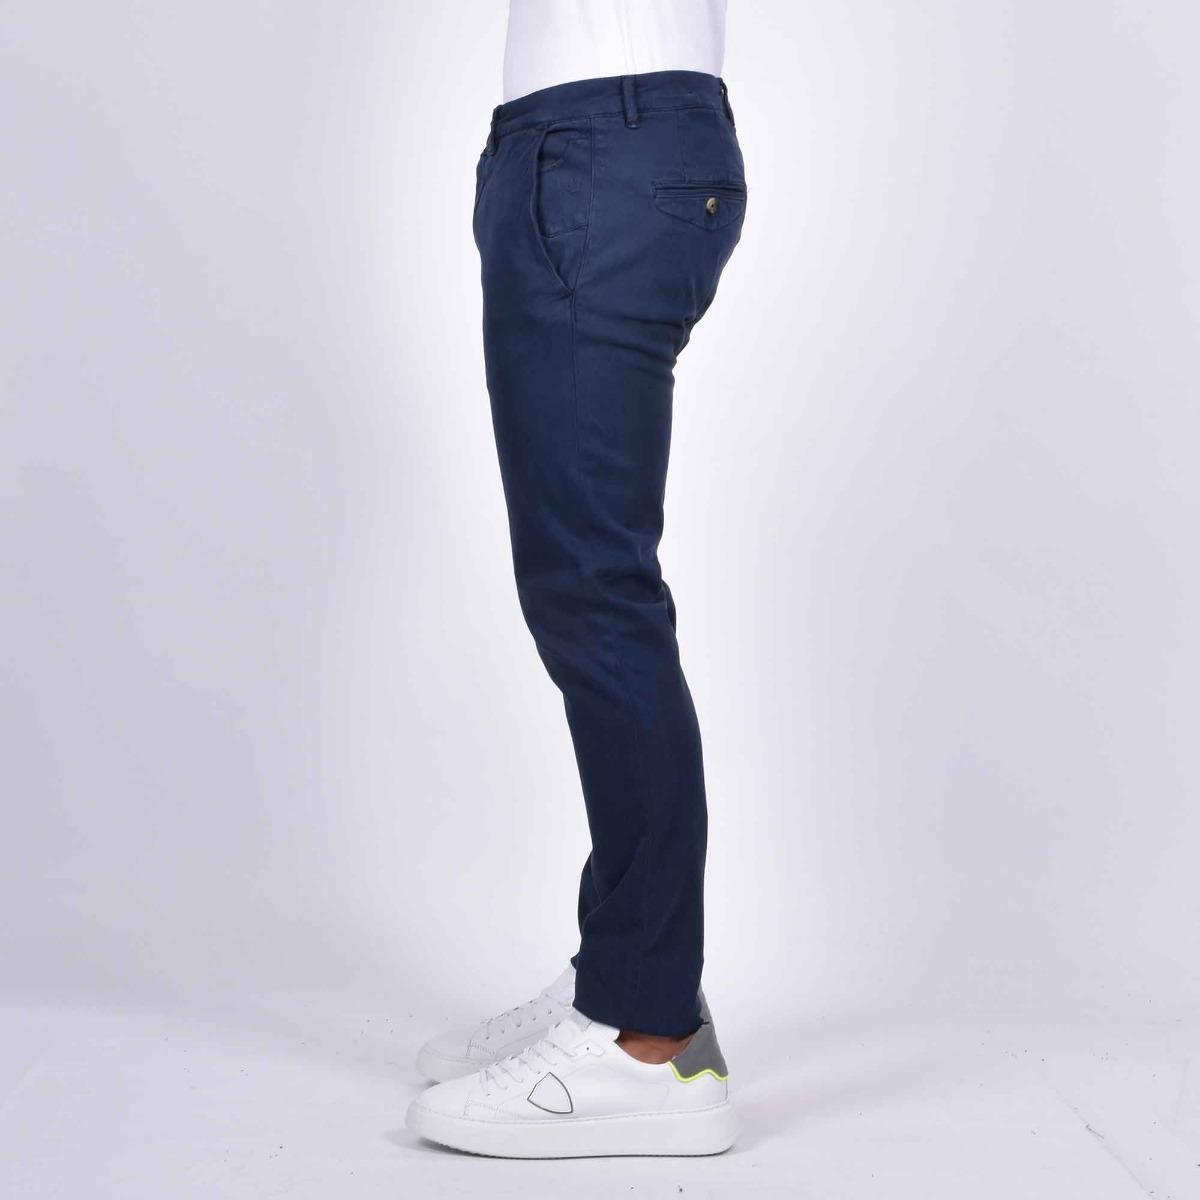 Pantalone chino slim - Blu scuro